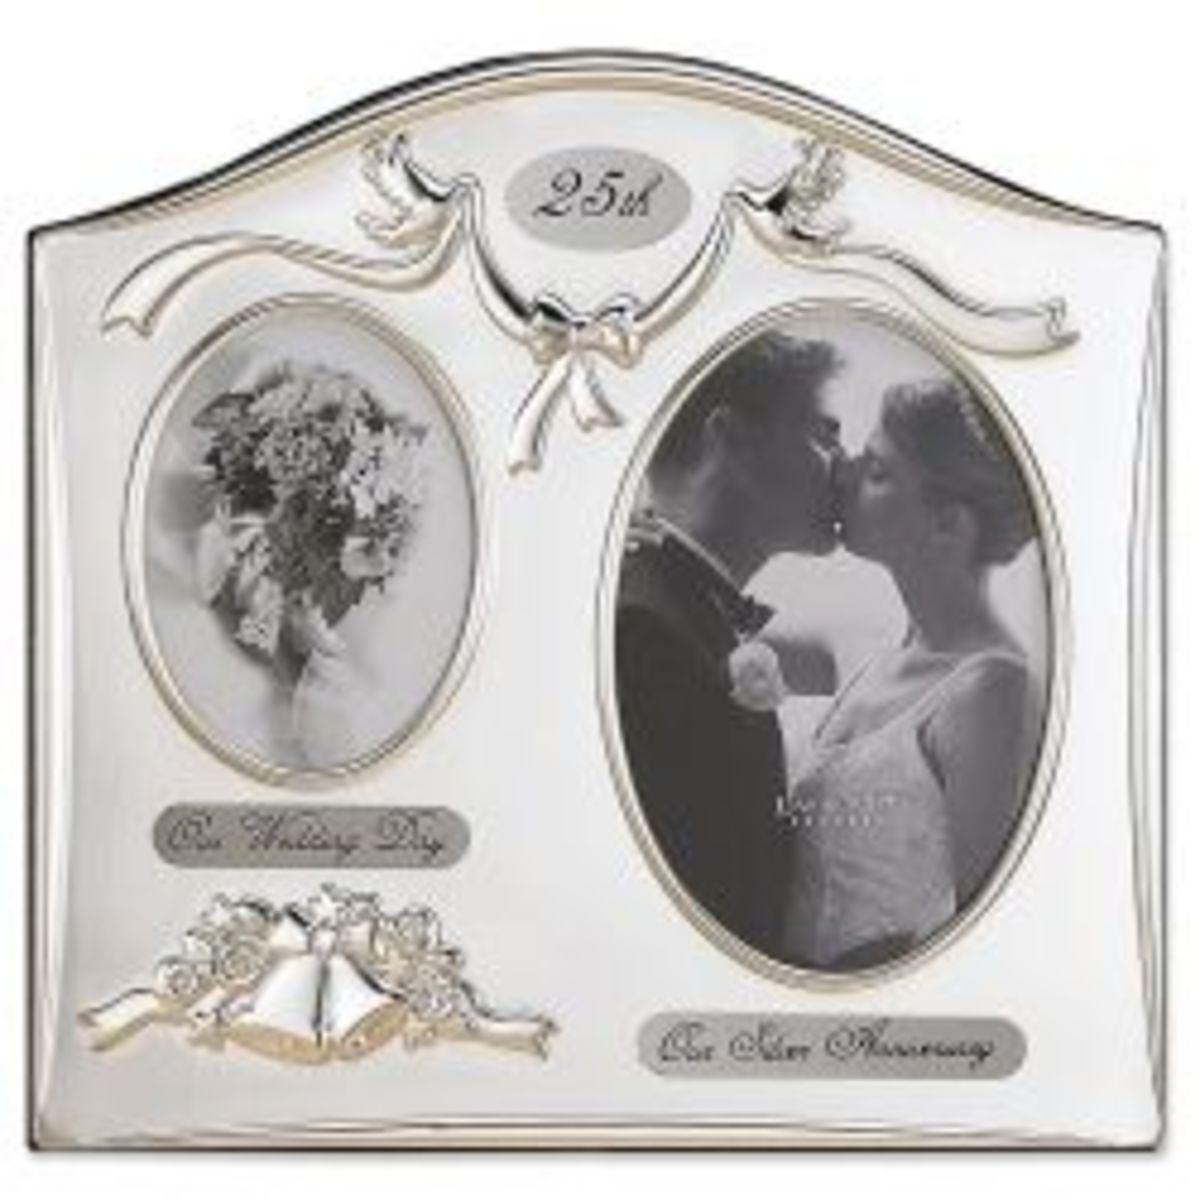 25th Anniversary Design Picture Frame